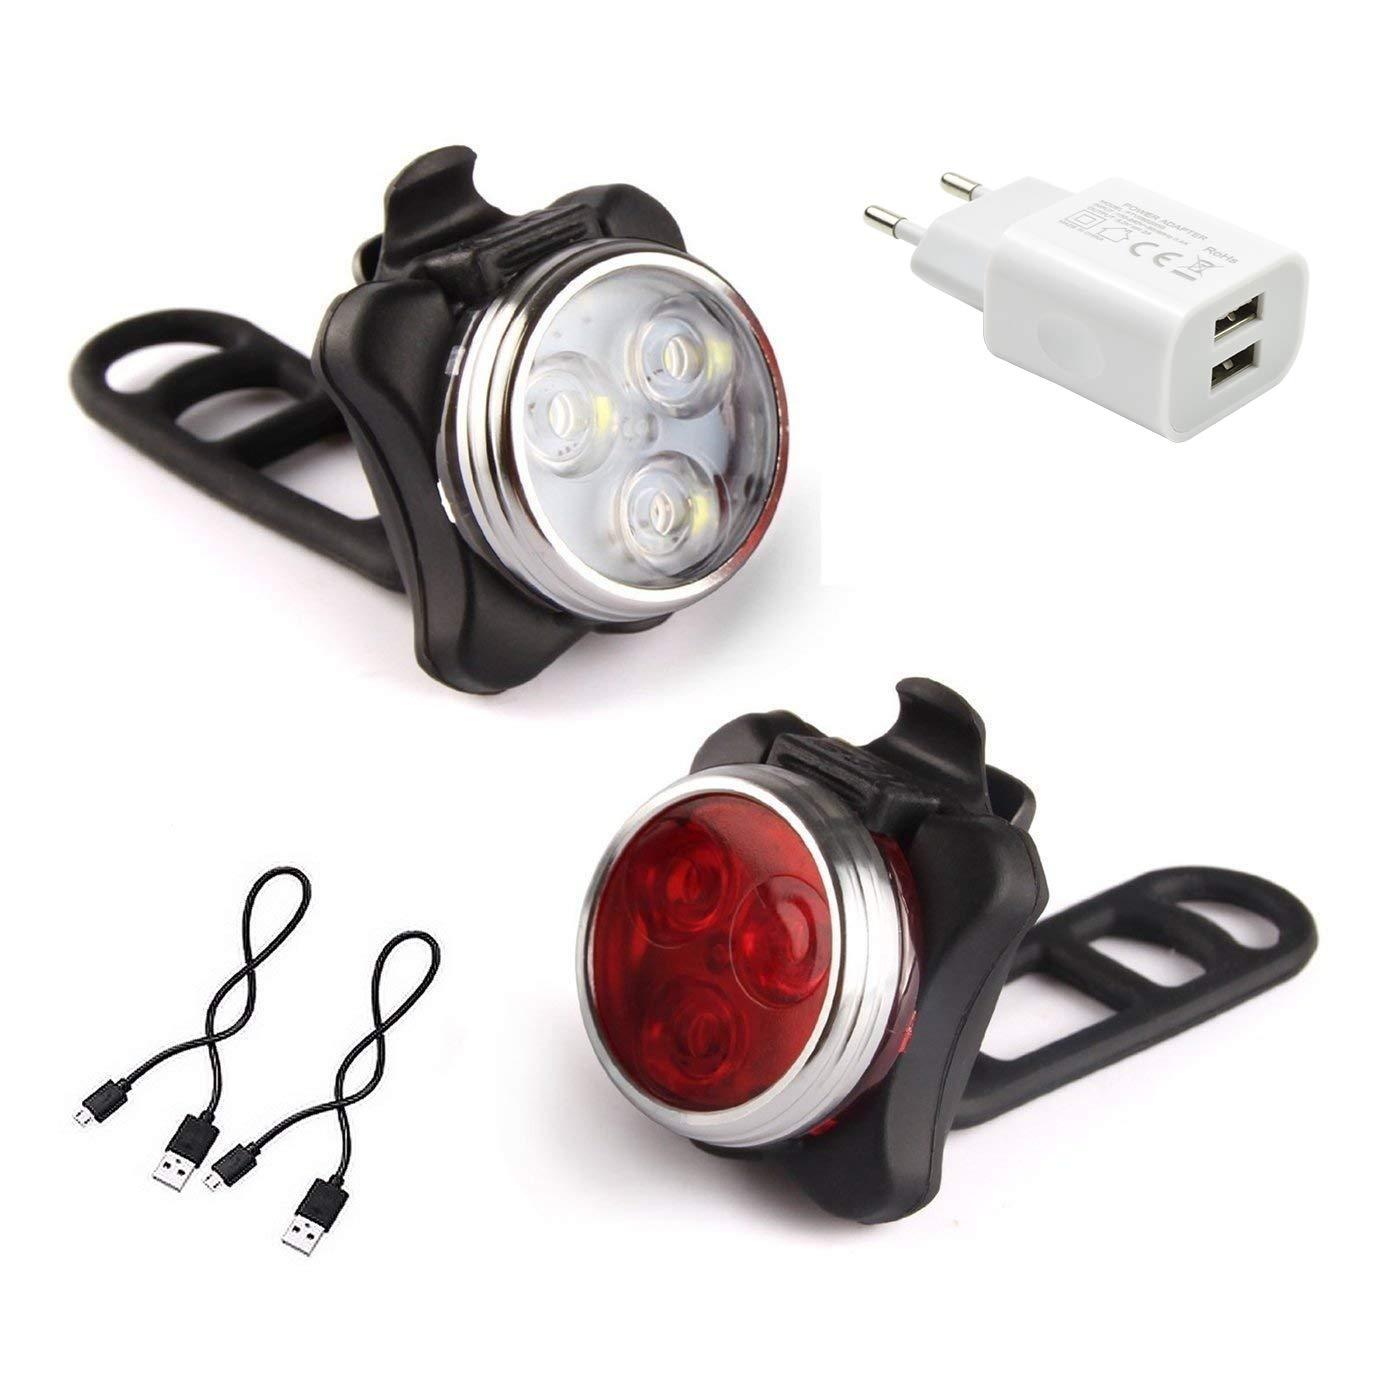 AMANKA Luces Bicicleta LED, Luz para Bicicleta por USB Conjunto de Luces Delantera y Trasera para Bicicleta 4 Modo 650mAh Reflector Bici Seguridad Faro de Señal